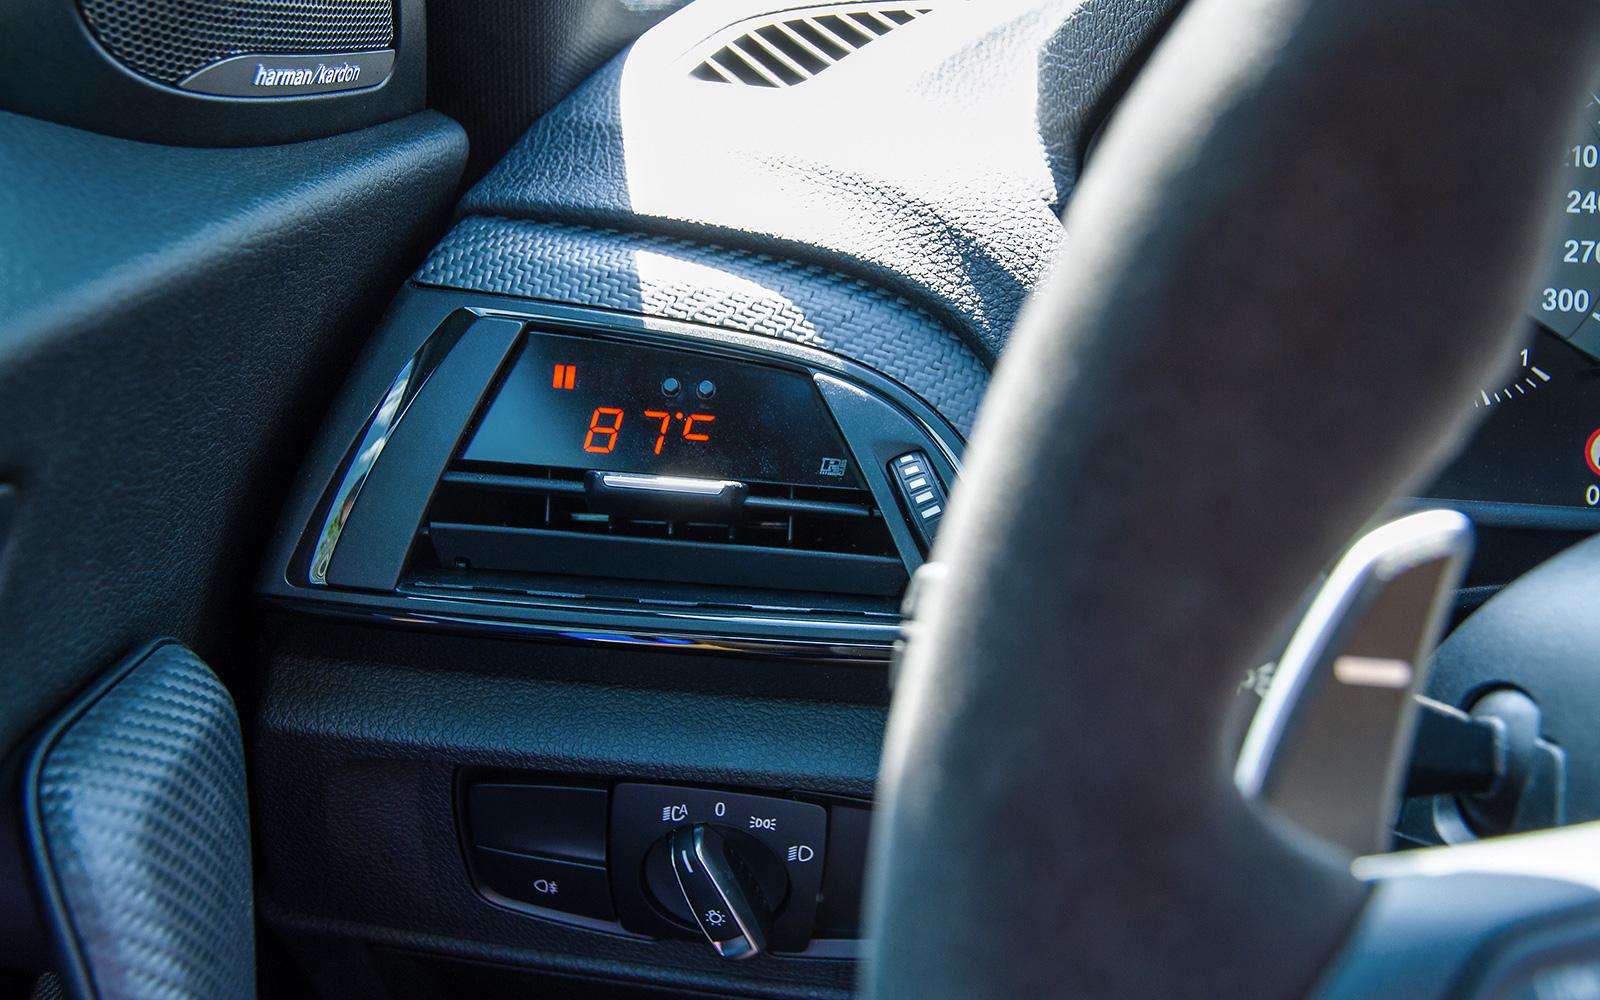 Secret' digital display menu - BMW M2 Forum